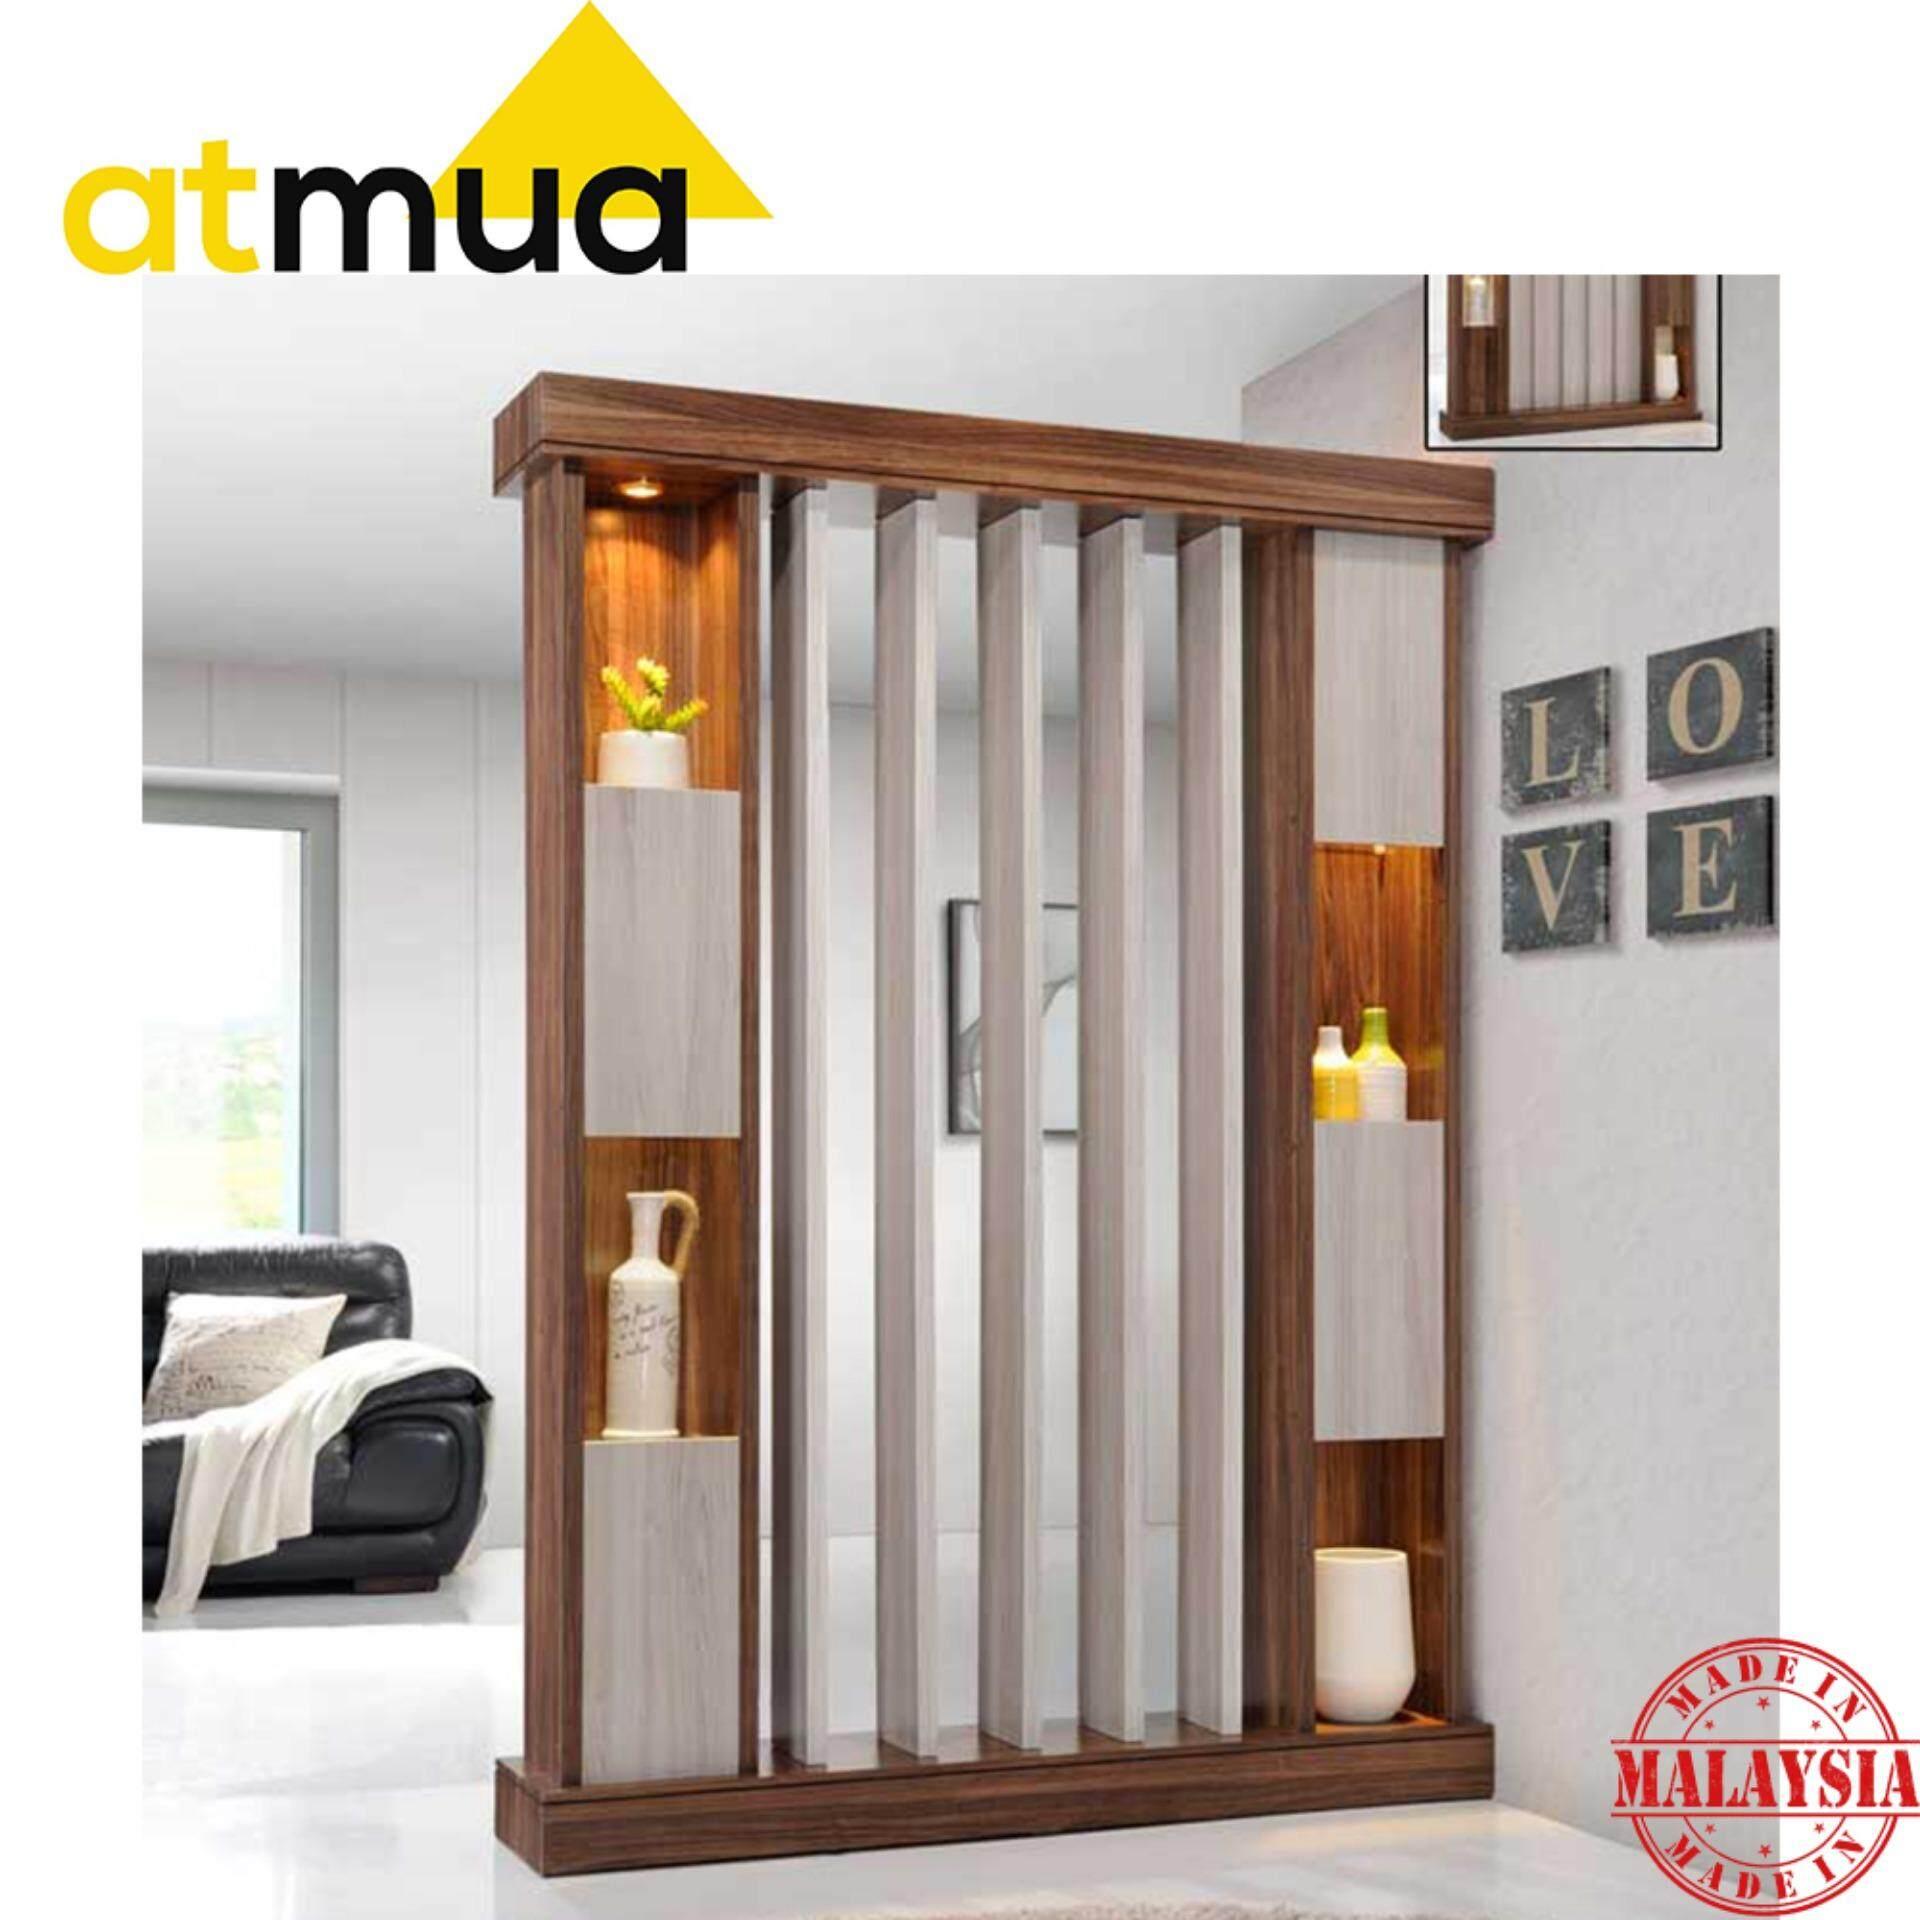 Atmua Smith Living Room Divider (5 feet) with Spotlight [Hollow MDF Board]